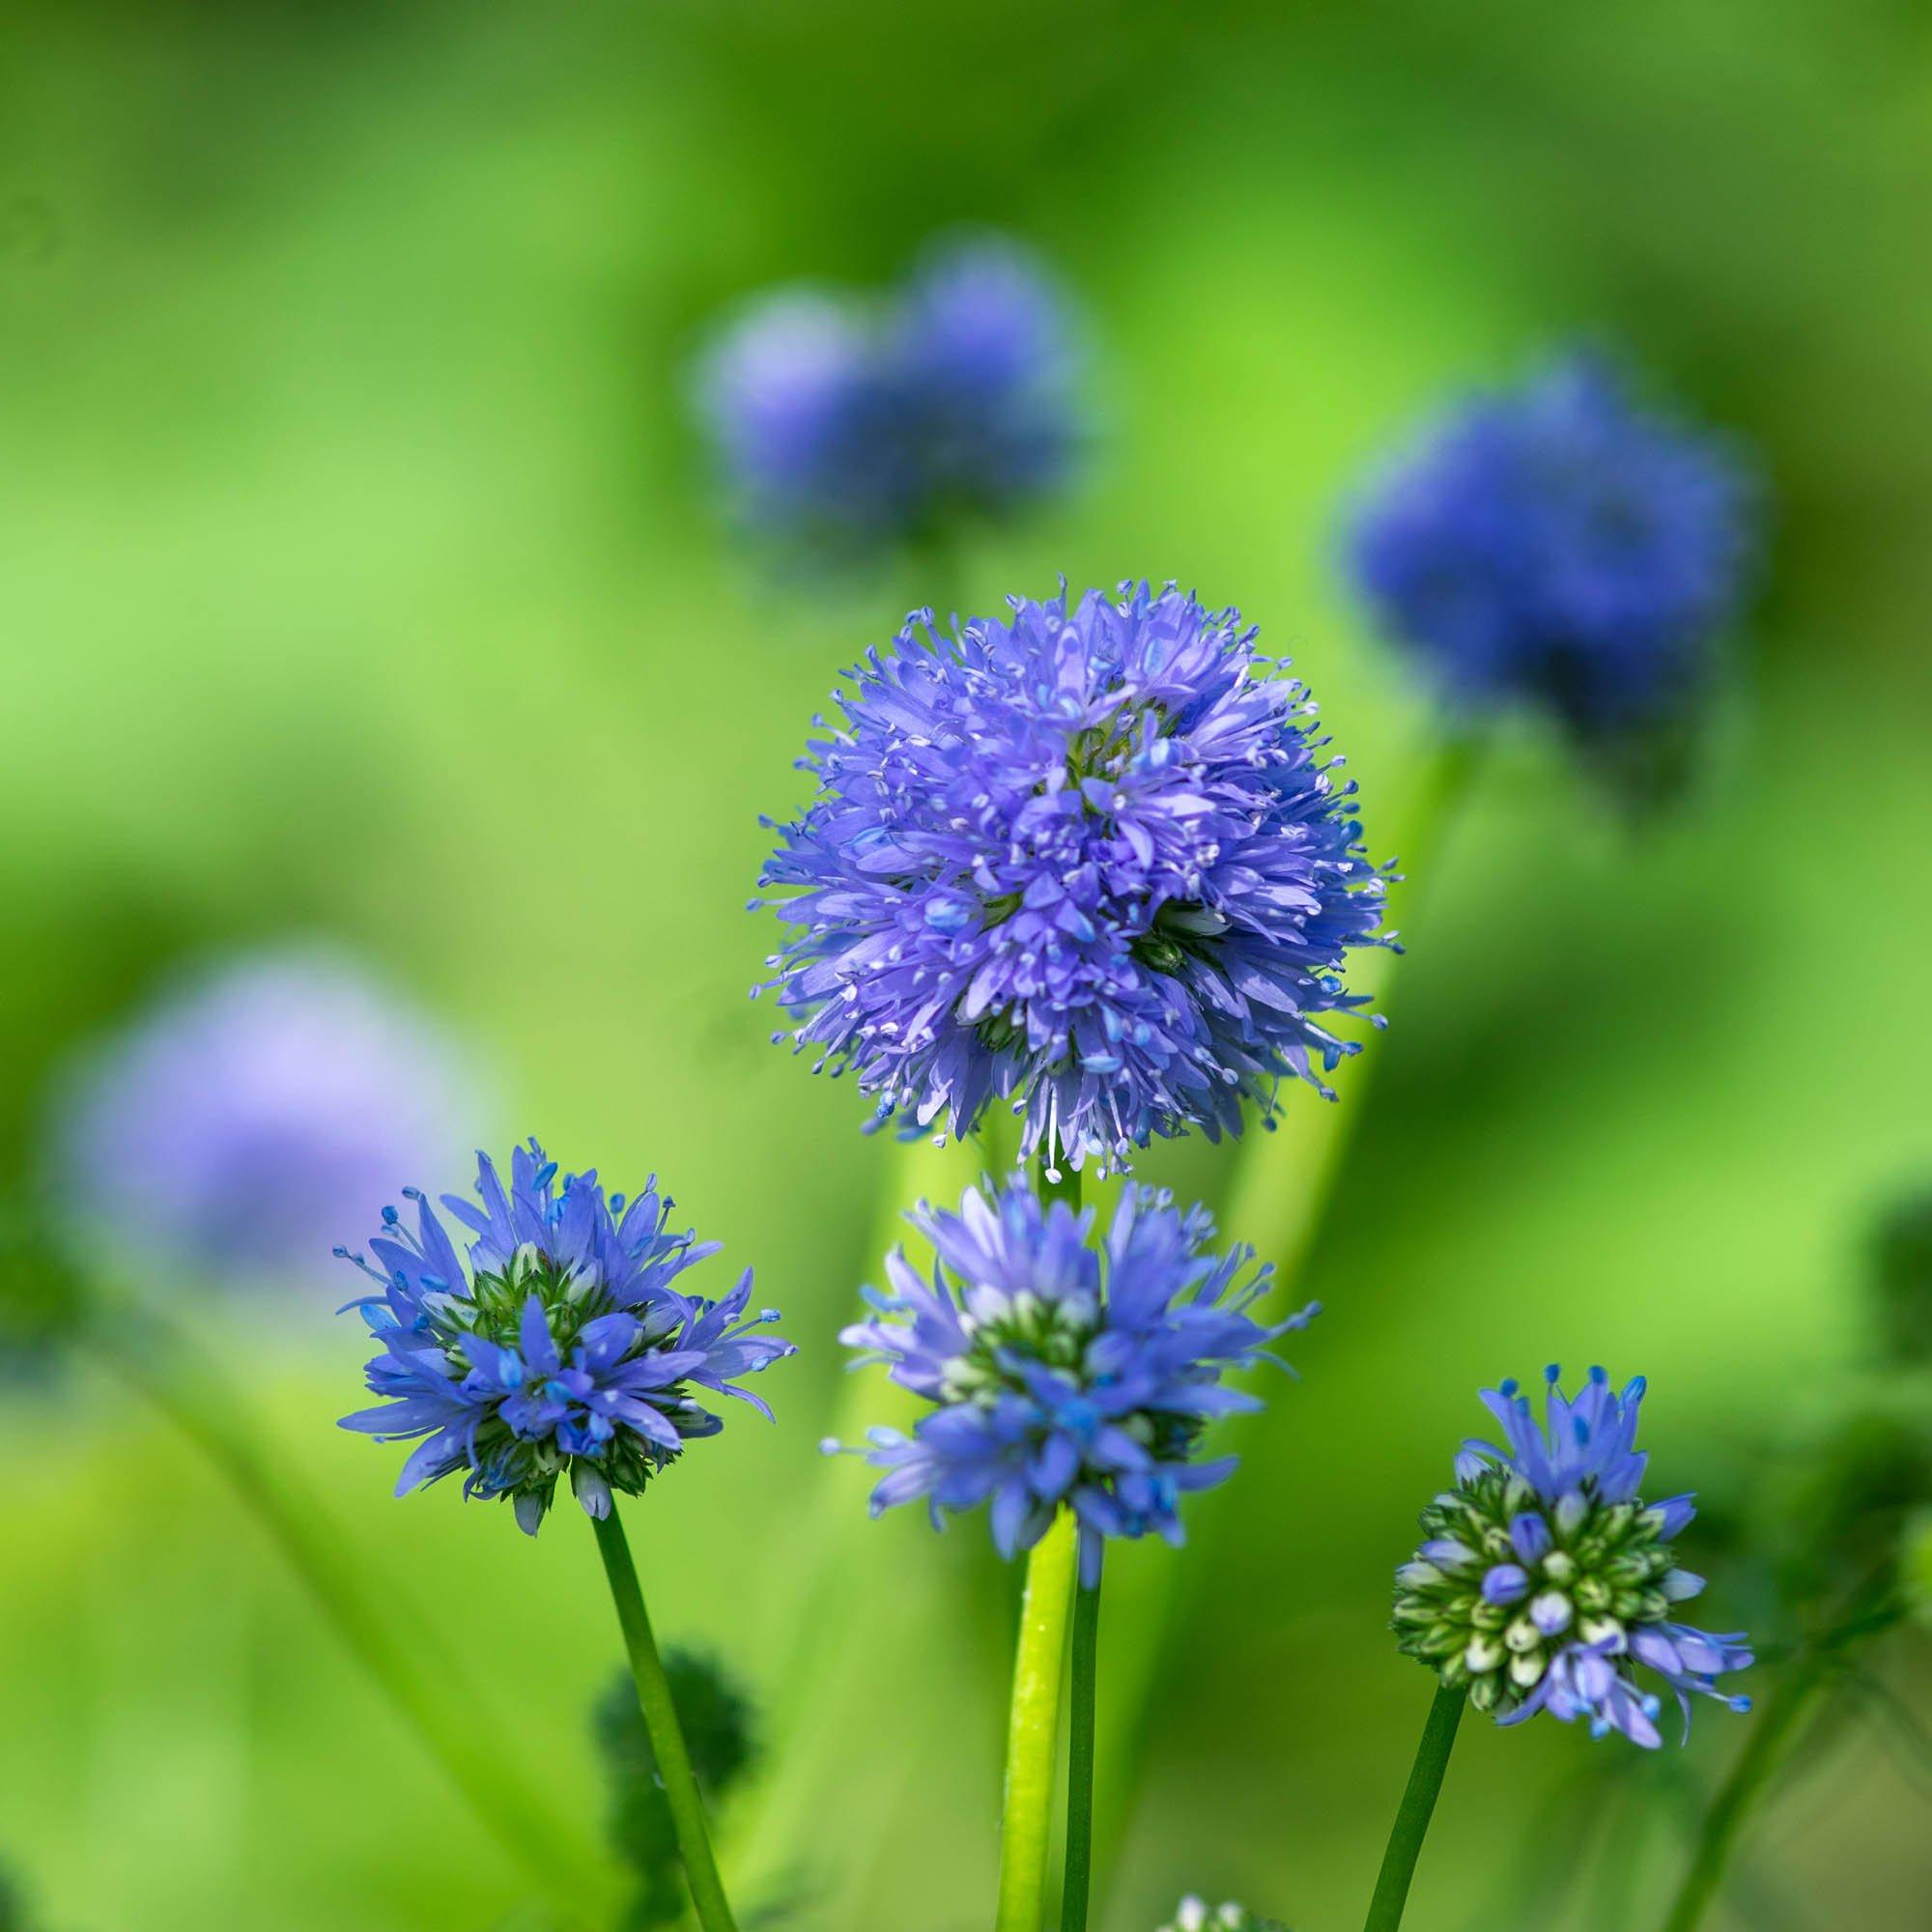 100 Seeds BOGO 50/% off SALE Details about  /Gilia Capitata- Queen Anne/'s Thimbles